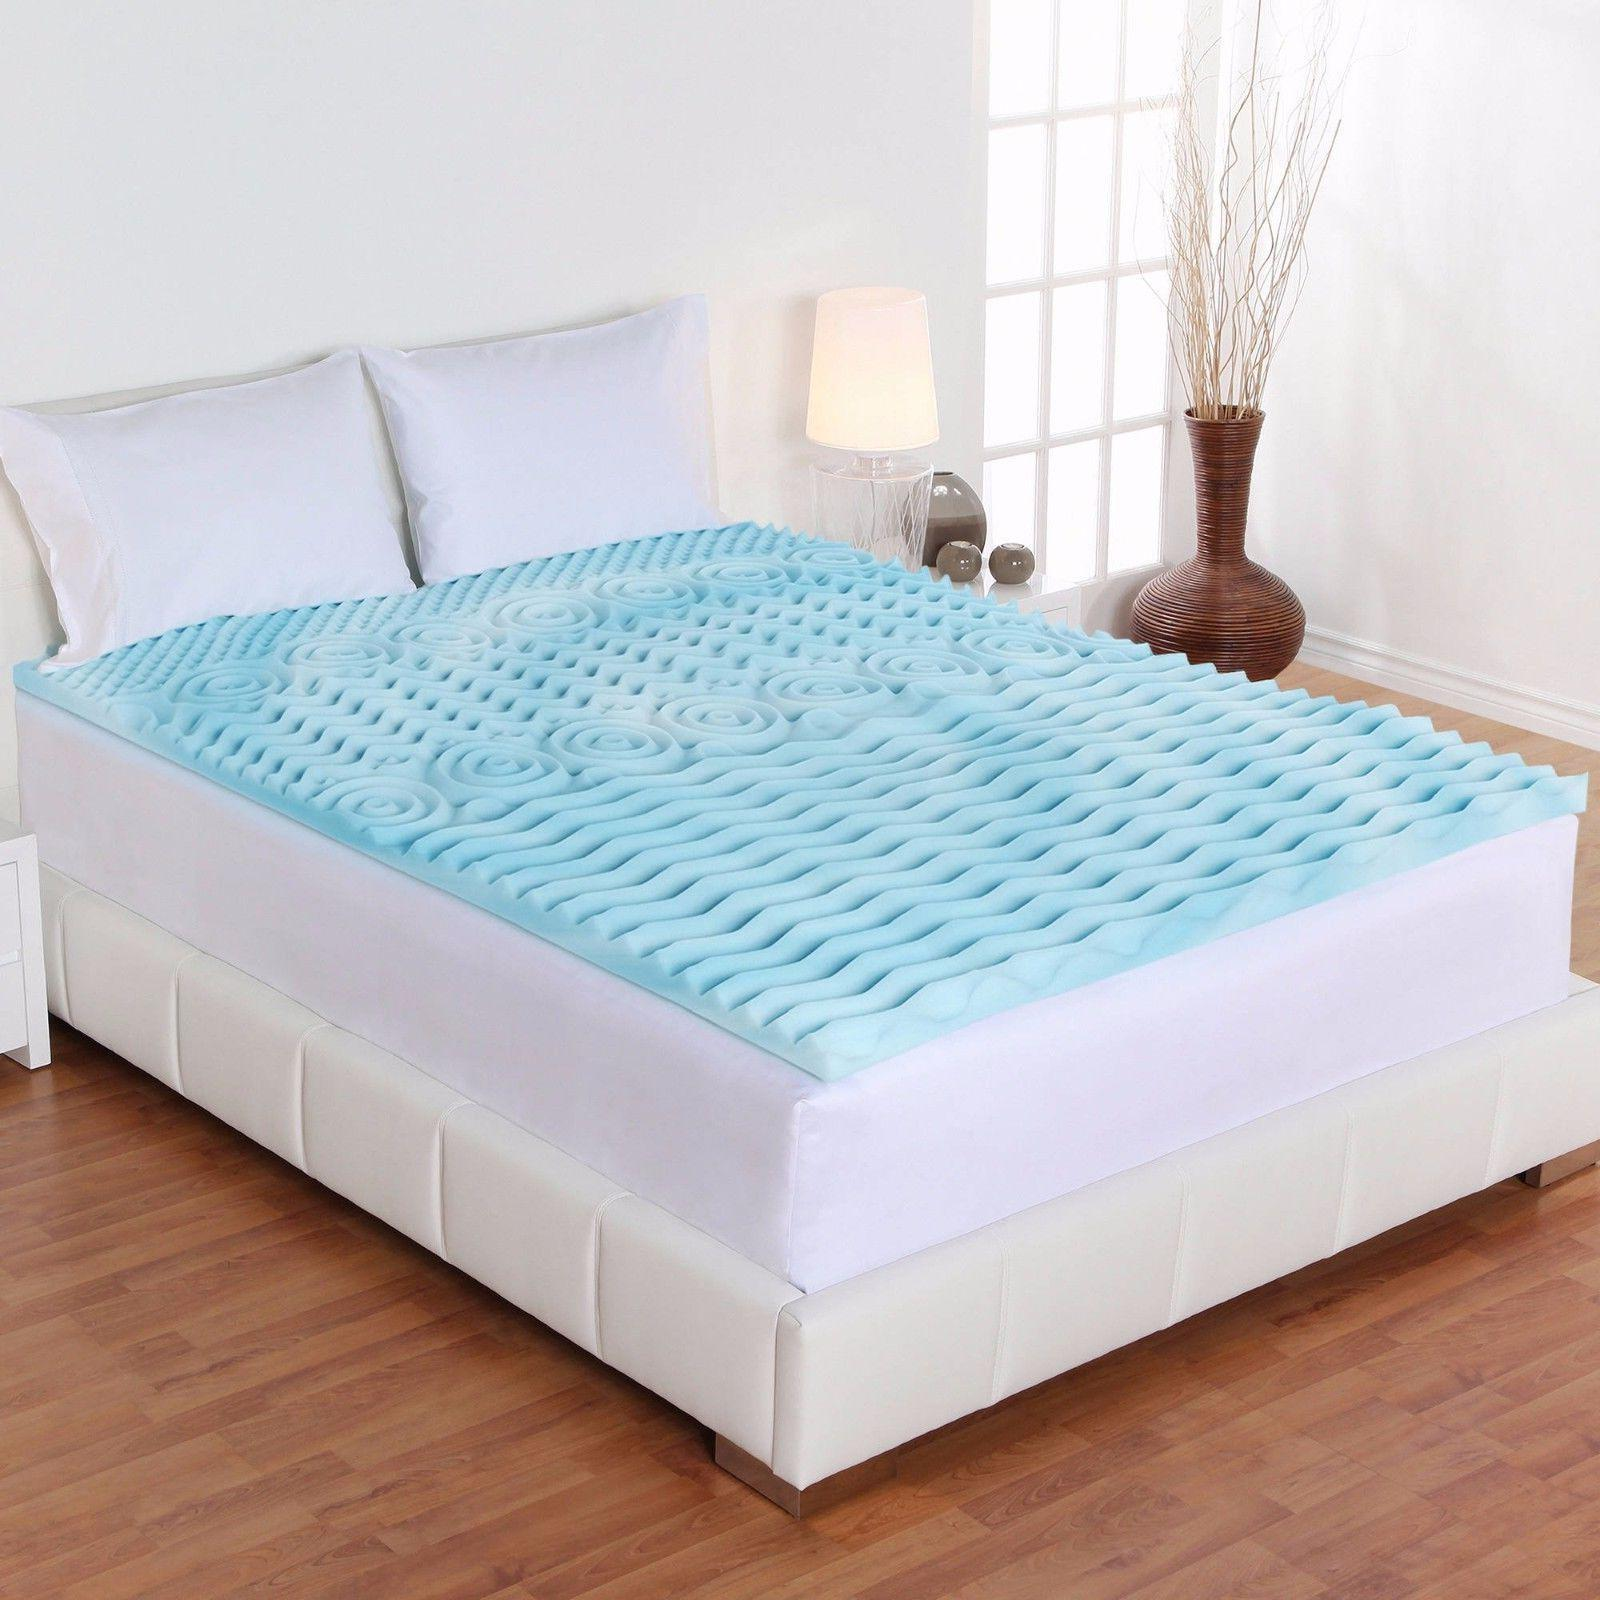 Mattress Gel Memory Foam Bed Cover Firm-Full King